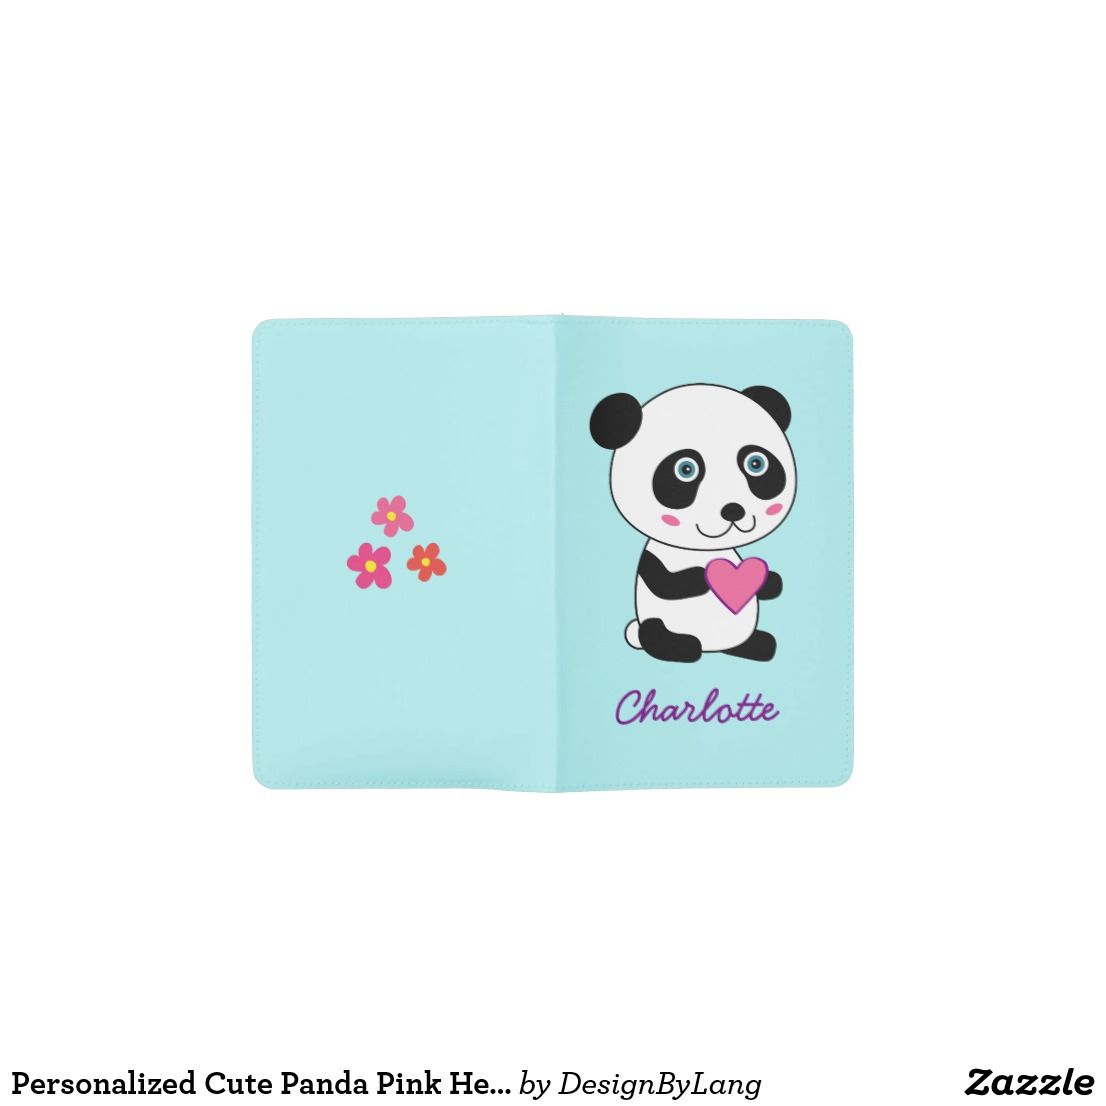 33edc3671a1f54 Personalized Cute Panda Pink Heart llustration Pocket Moleskine Notebook